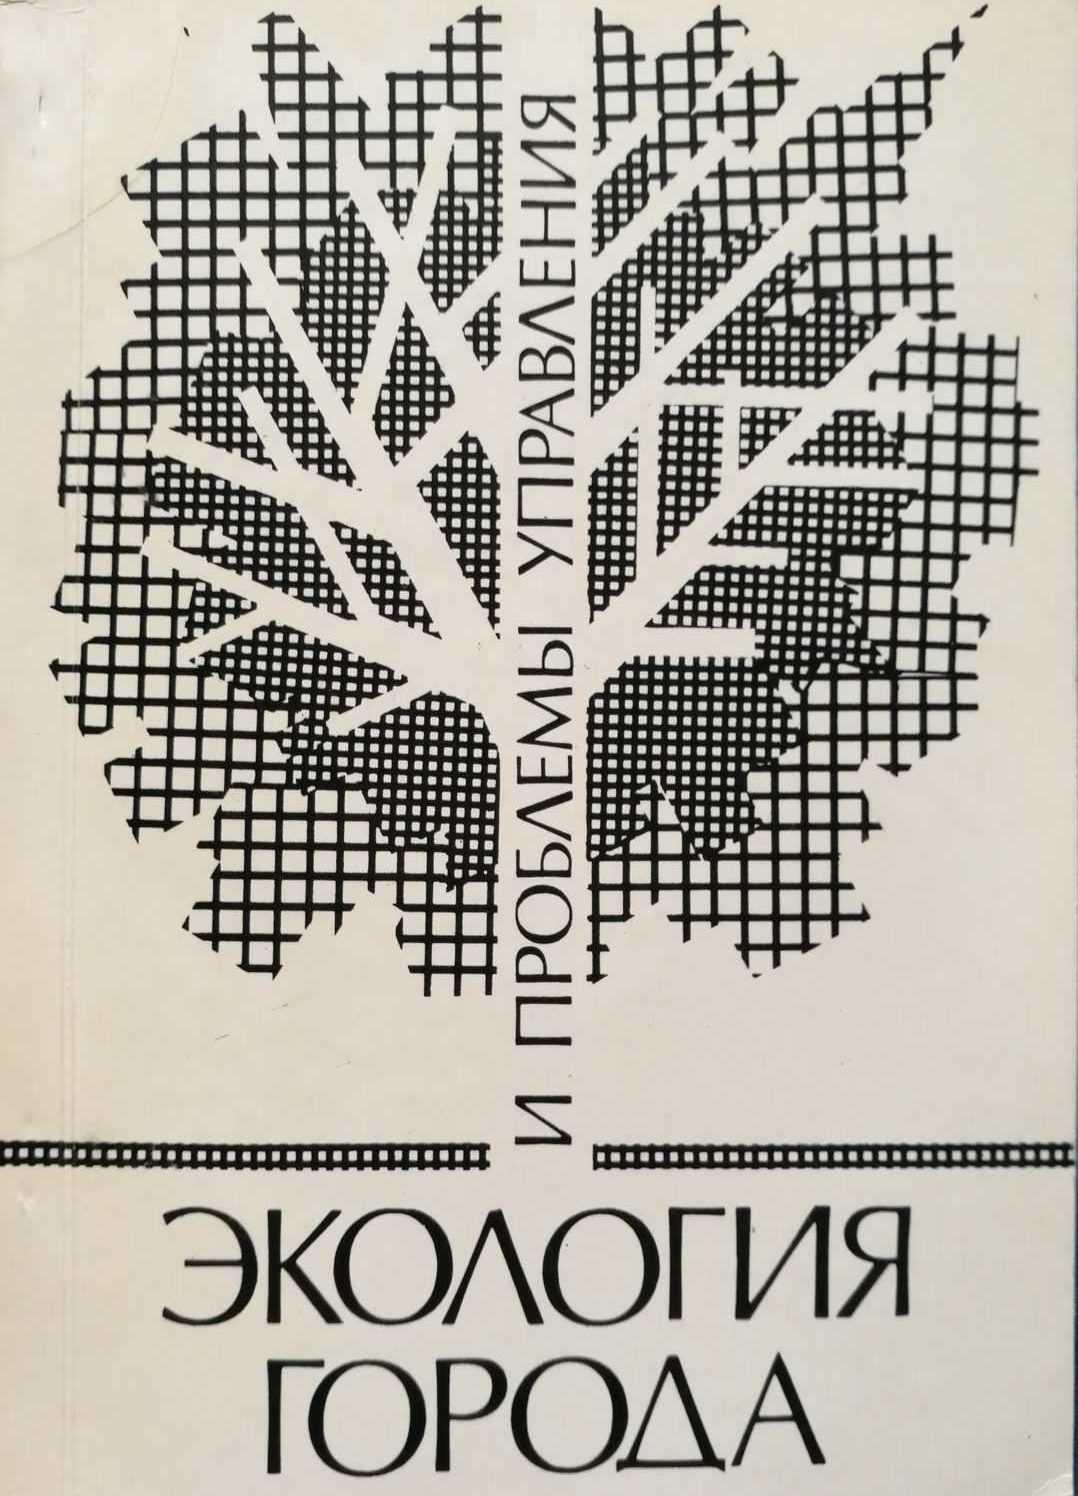 Ecologiya goroda i problemi upravleniya e1554577519876 - Философия развития и проблема города